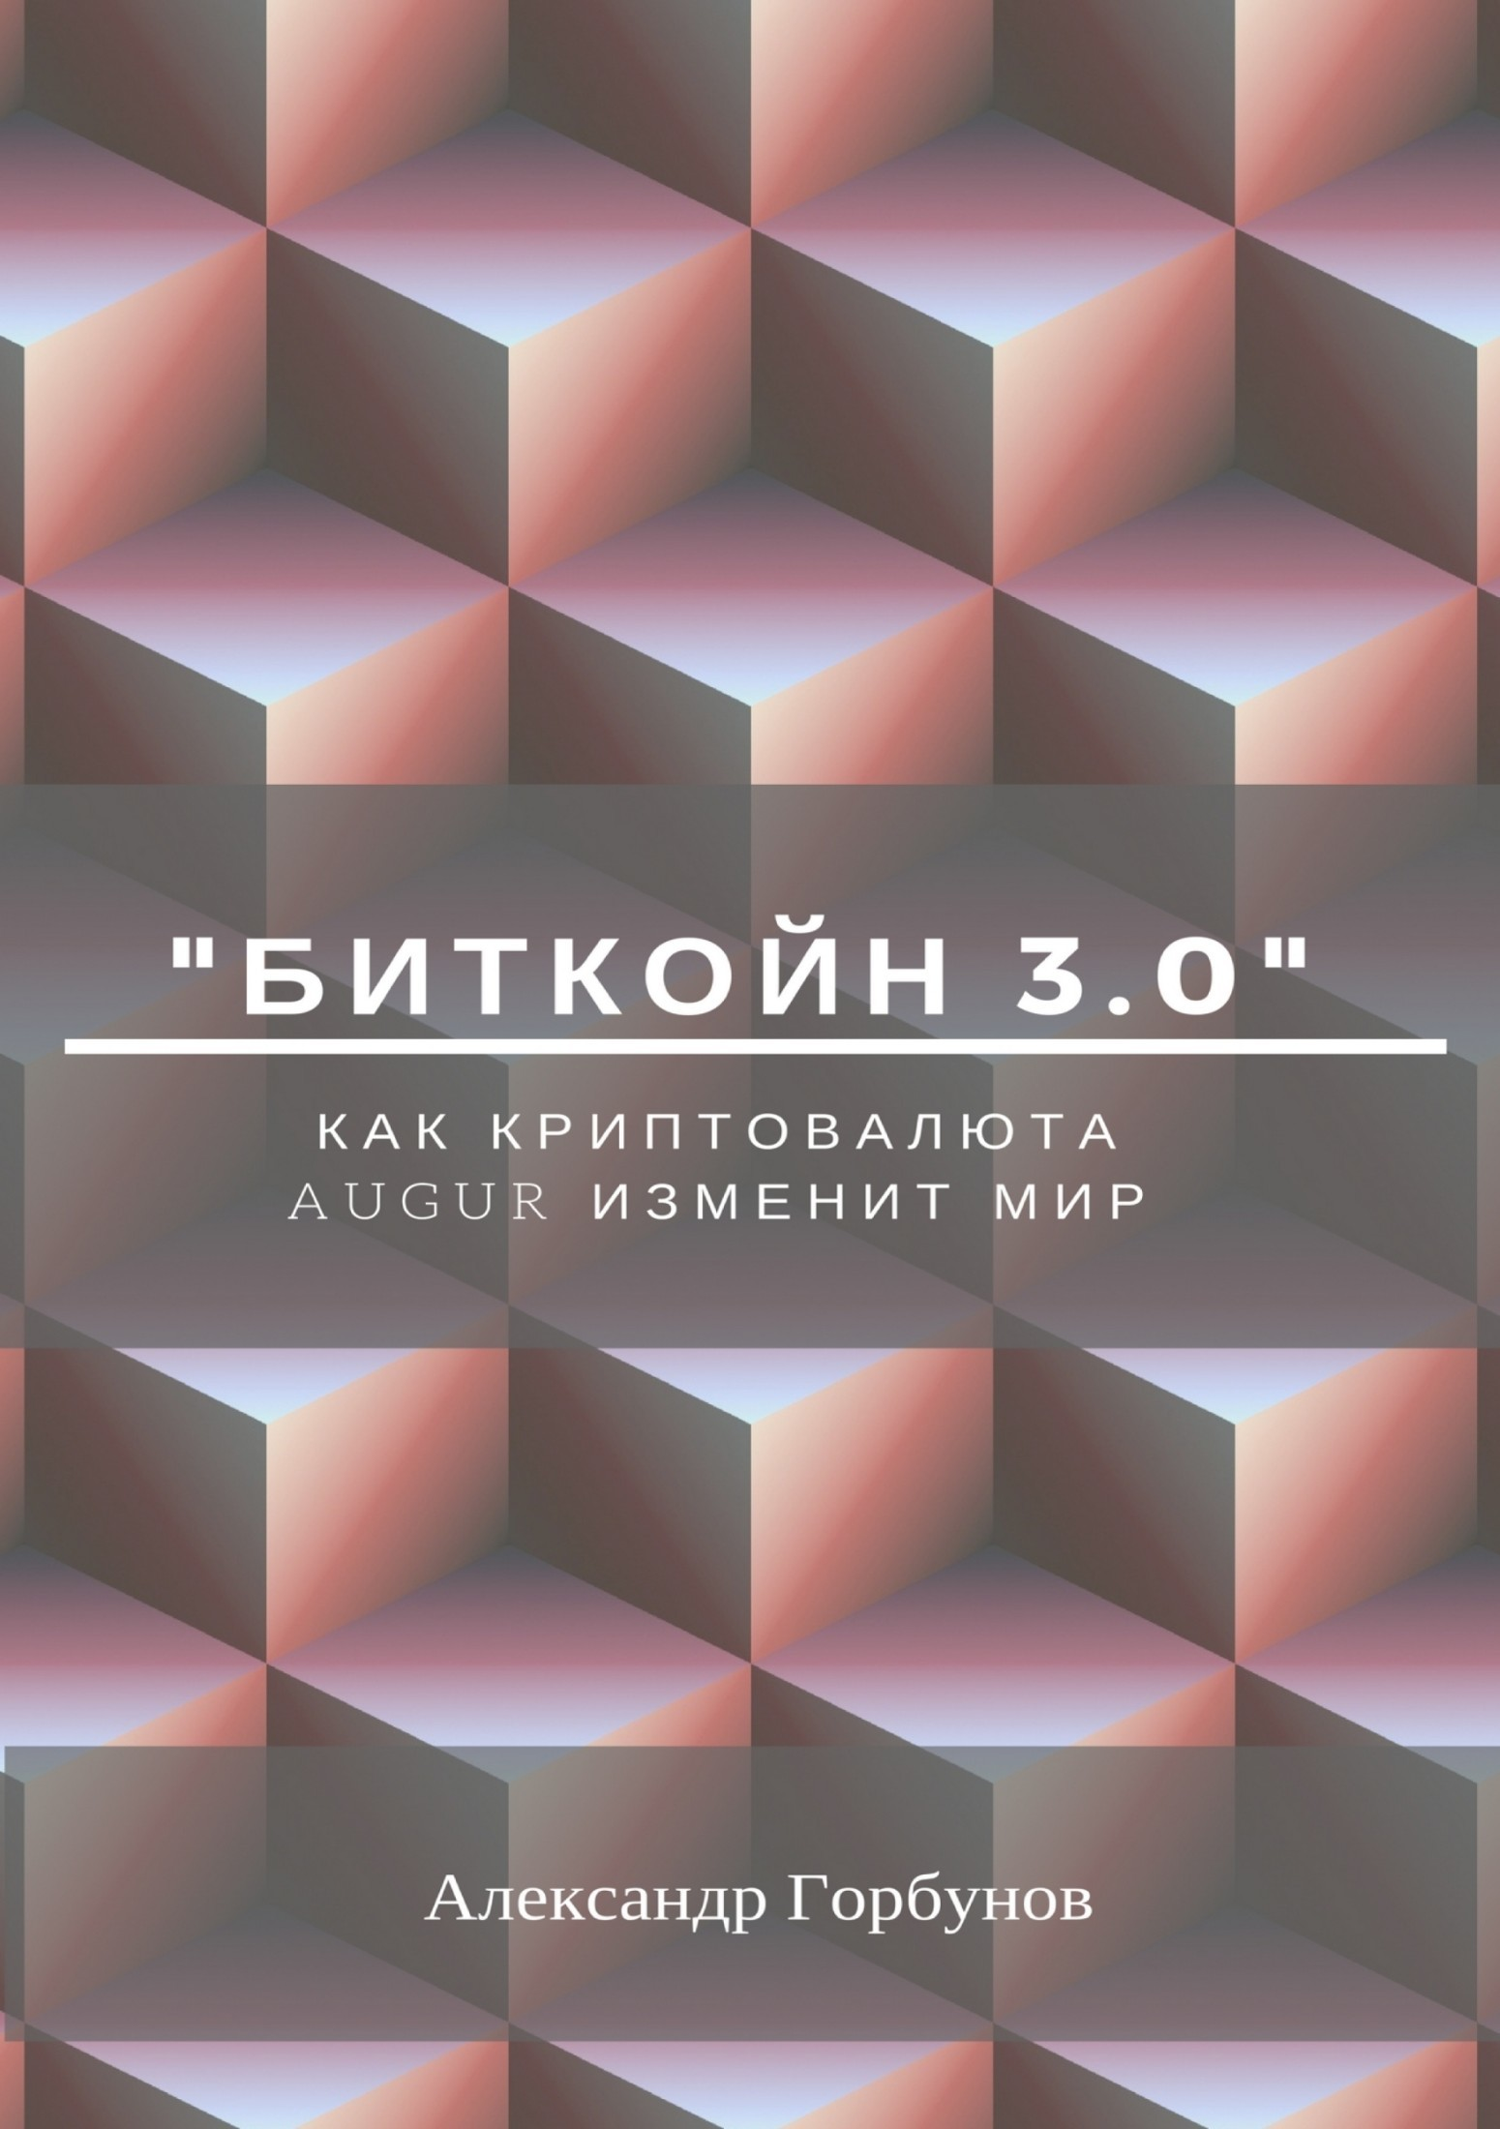 Обложка книги. Автор - Александр Горбунов